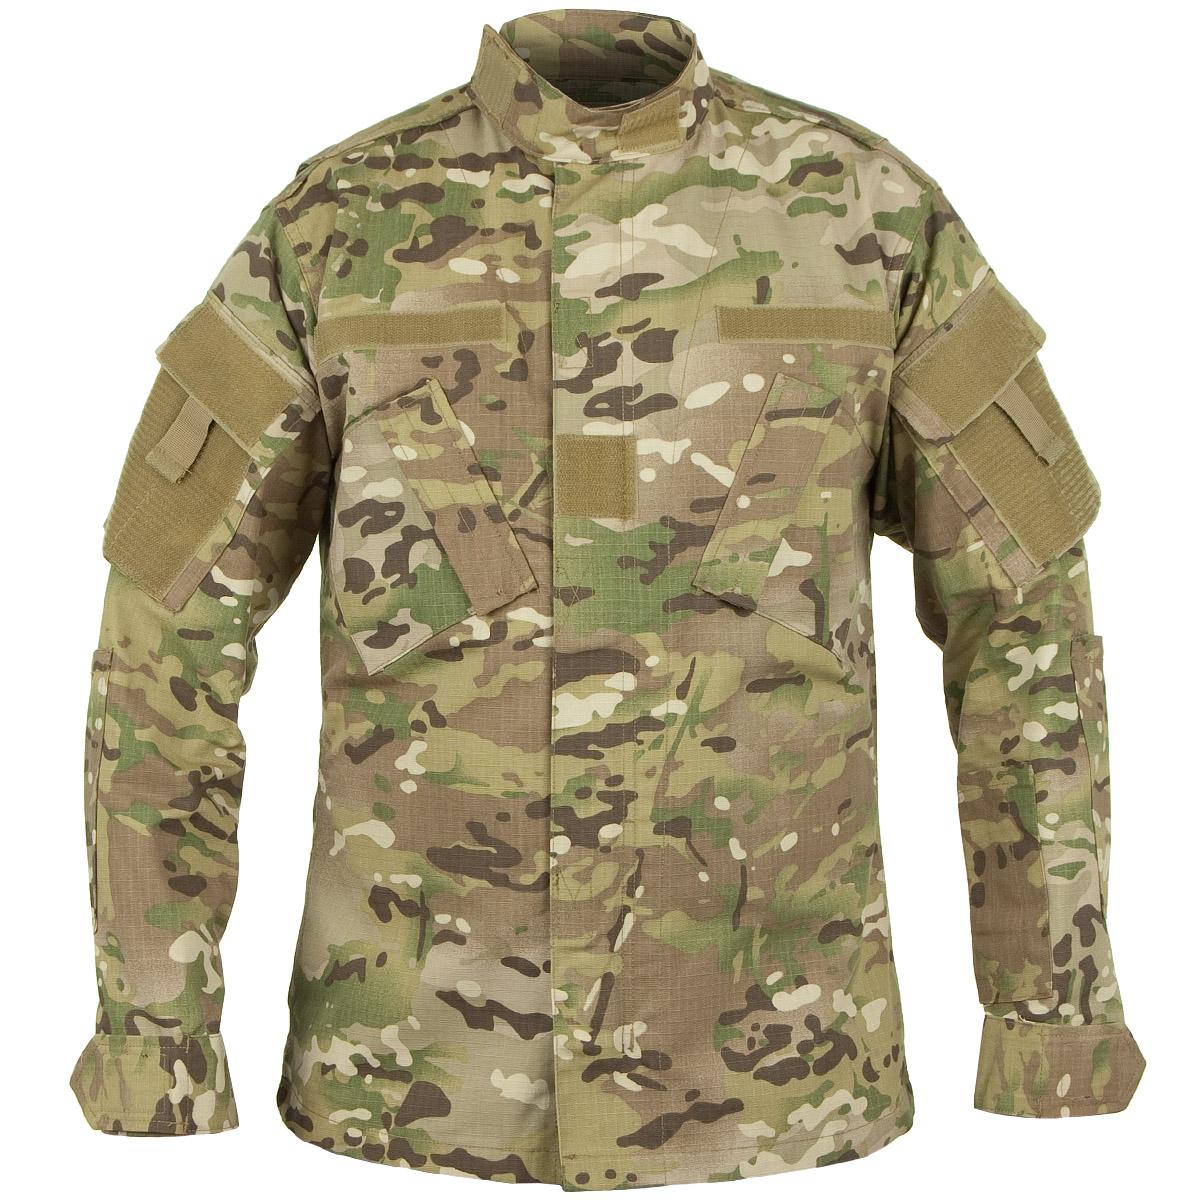 Military Uniform Shirt 100